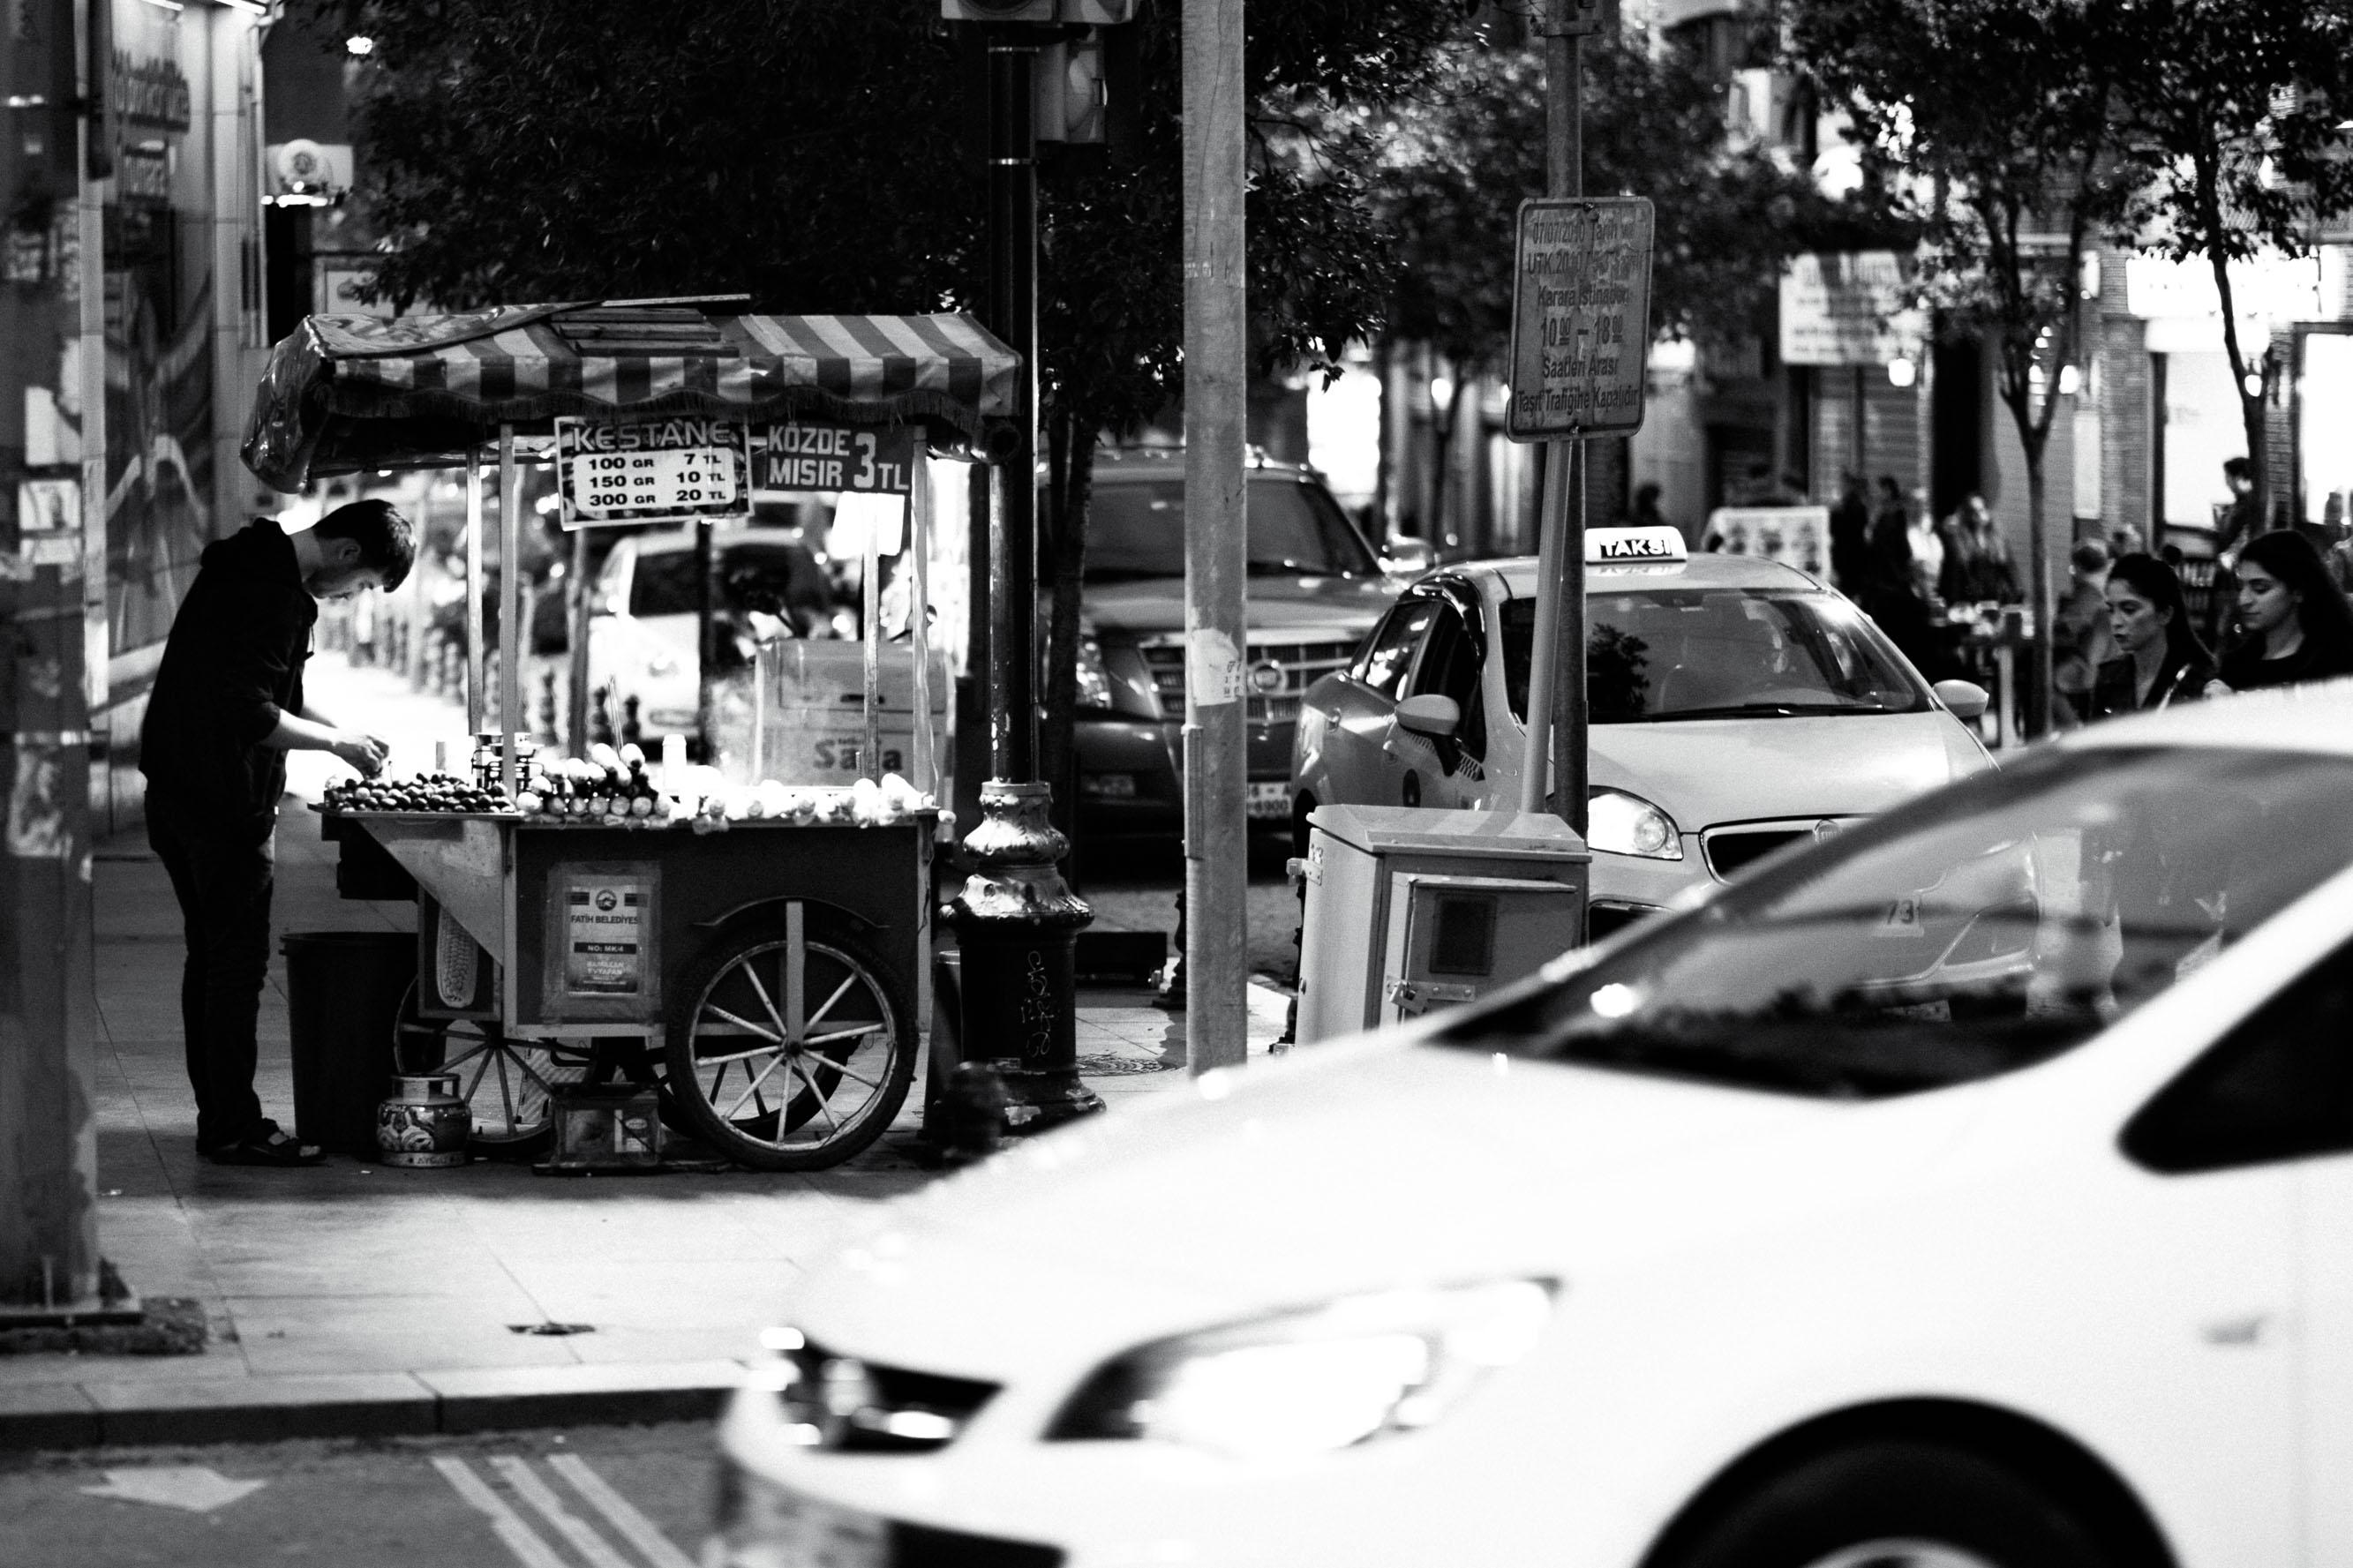 Sven-Michael---S-2018--14-[working-streets]---©-Sven-Michael-Golimowski.jpg